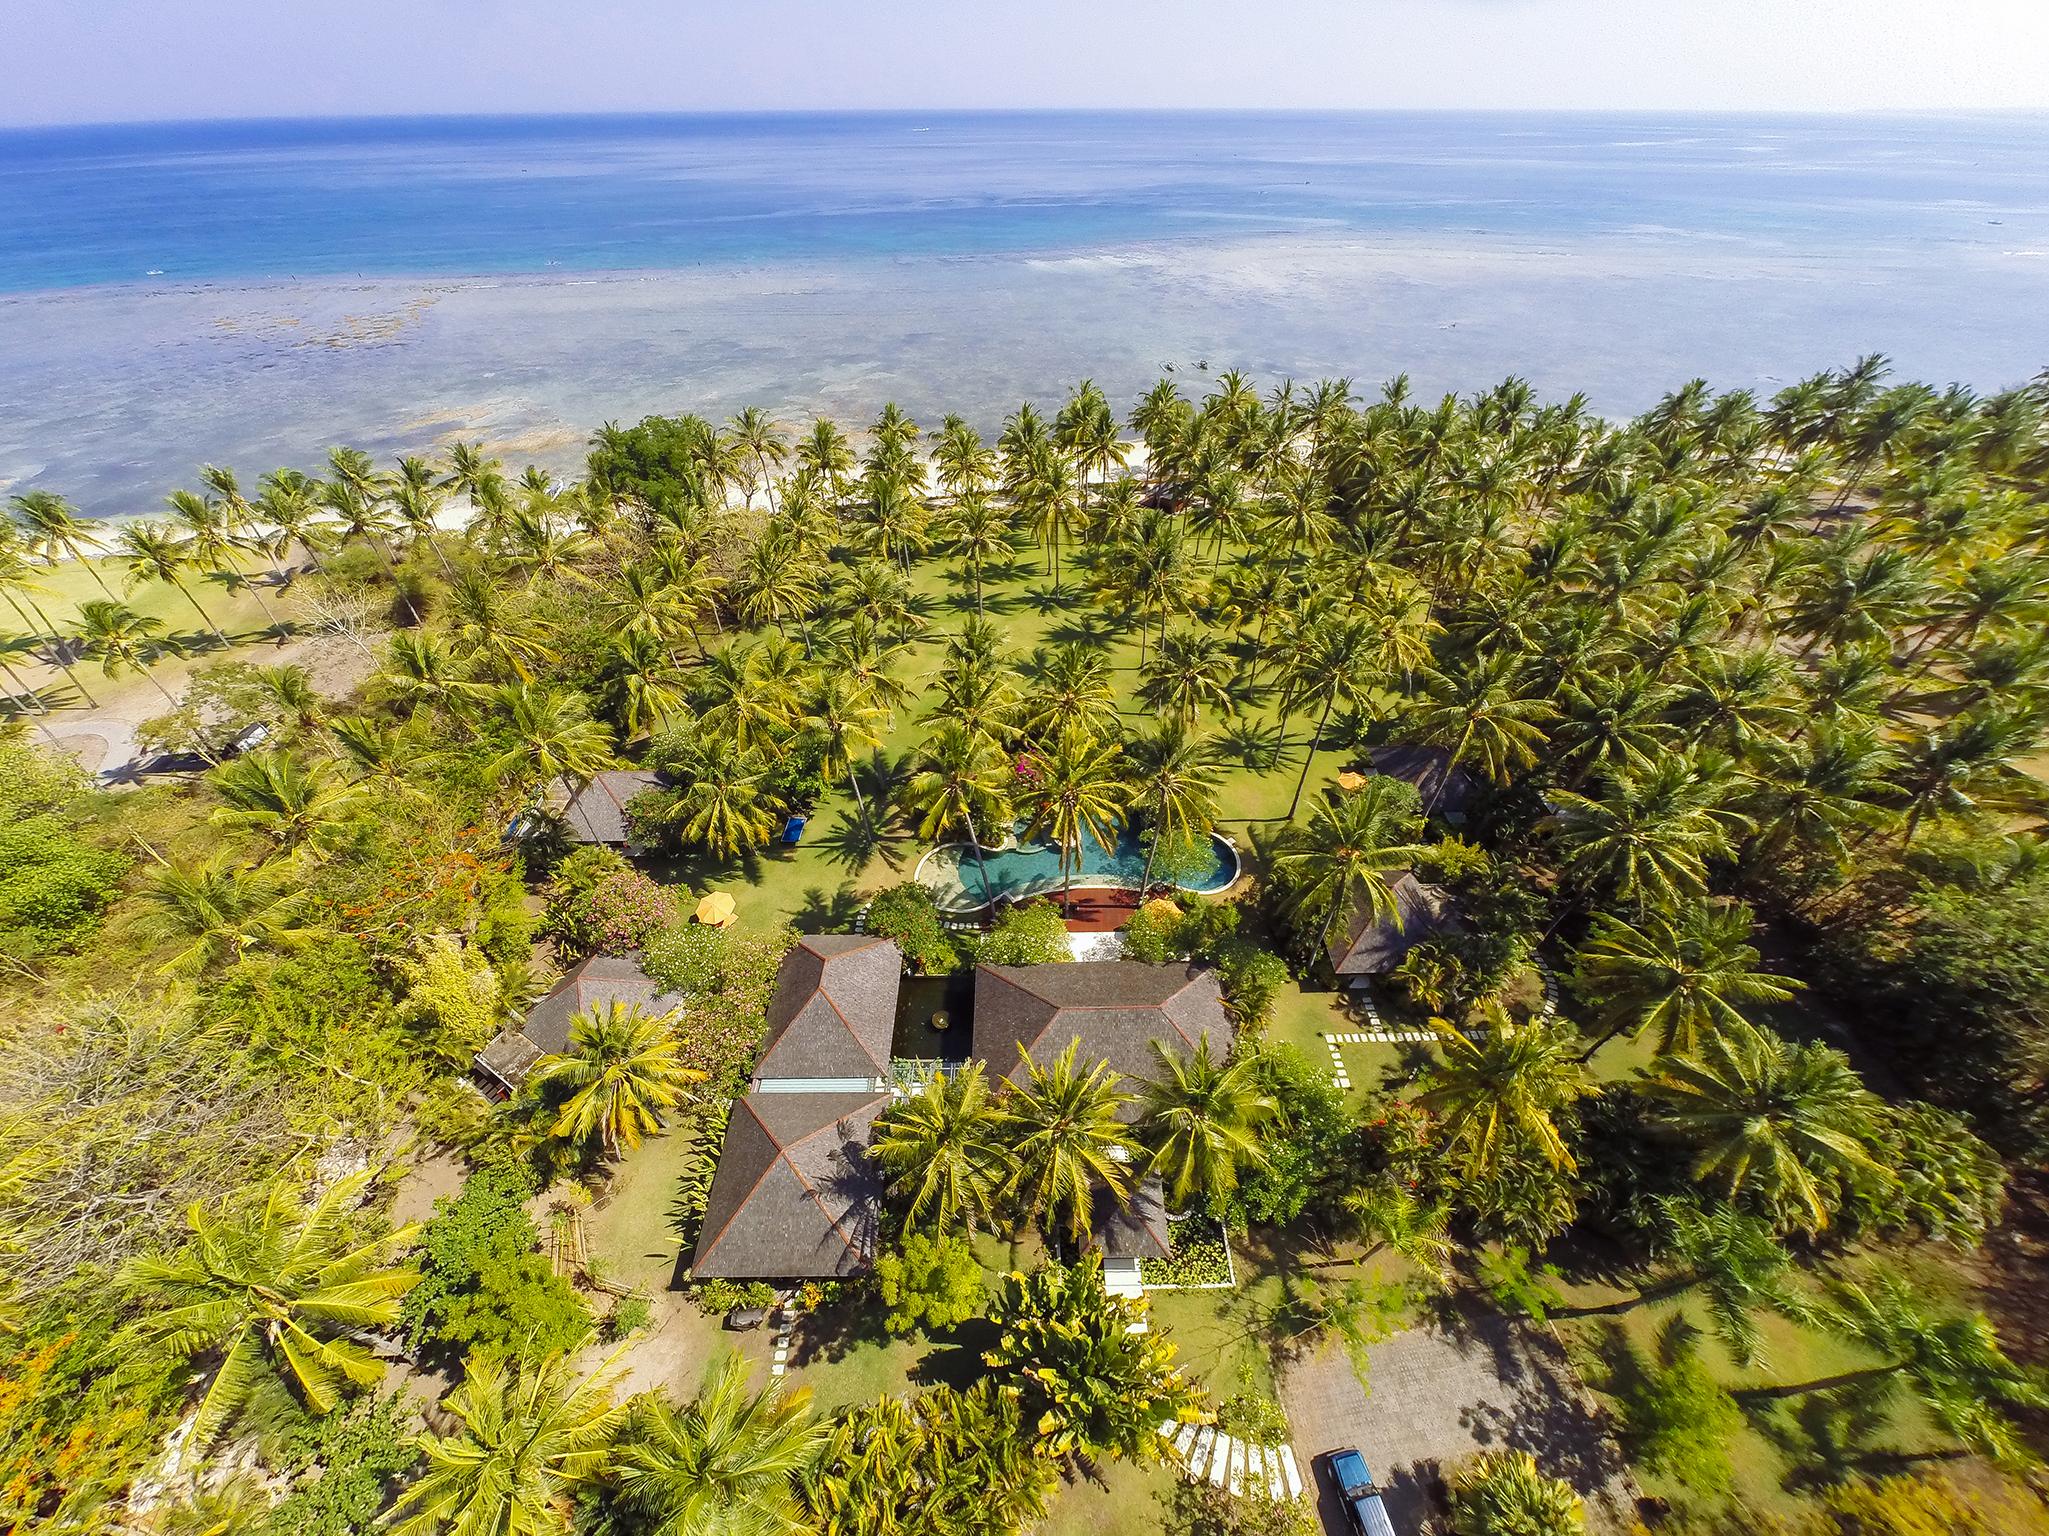 01-The Anandita - Villa grounds and ocean.jpg